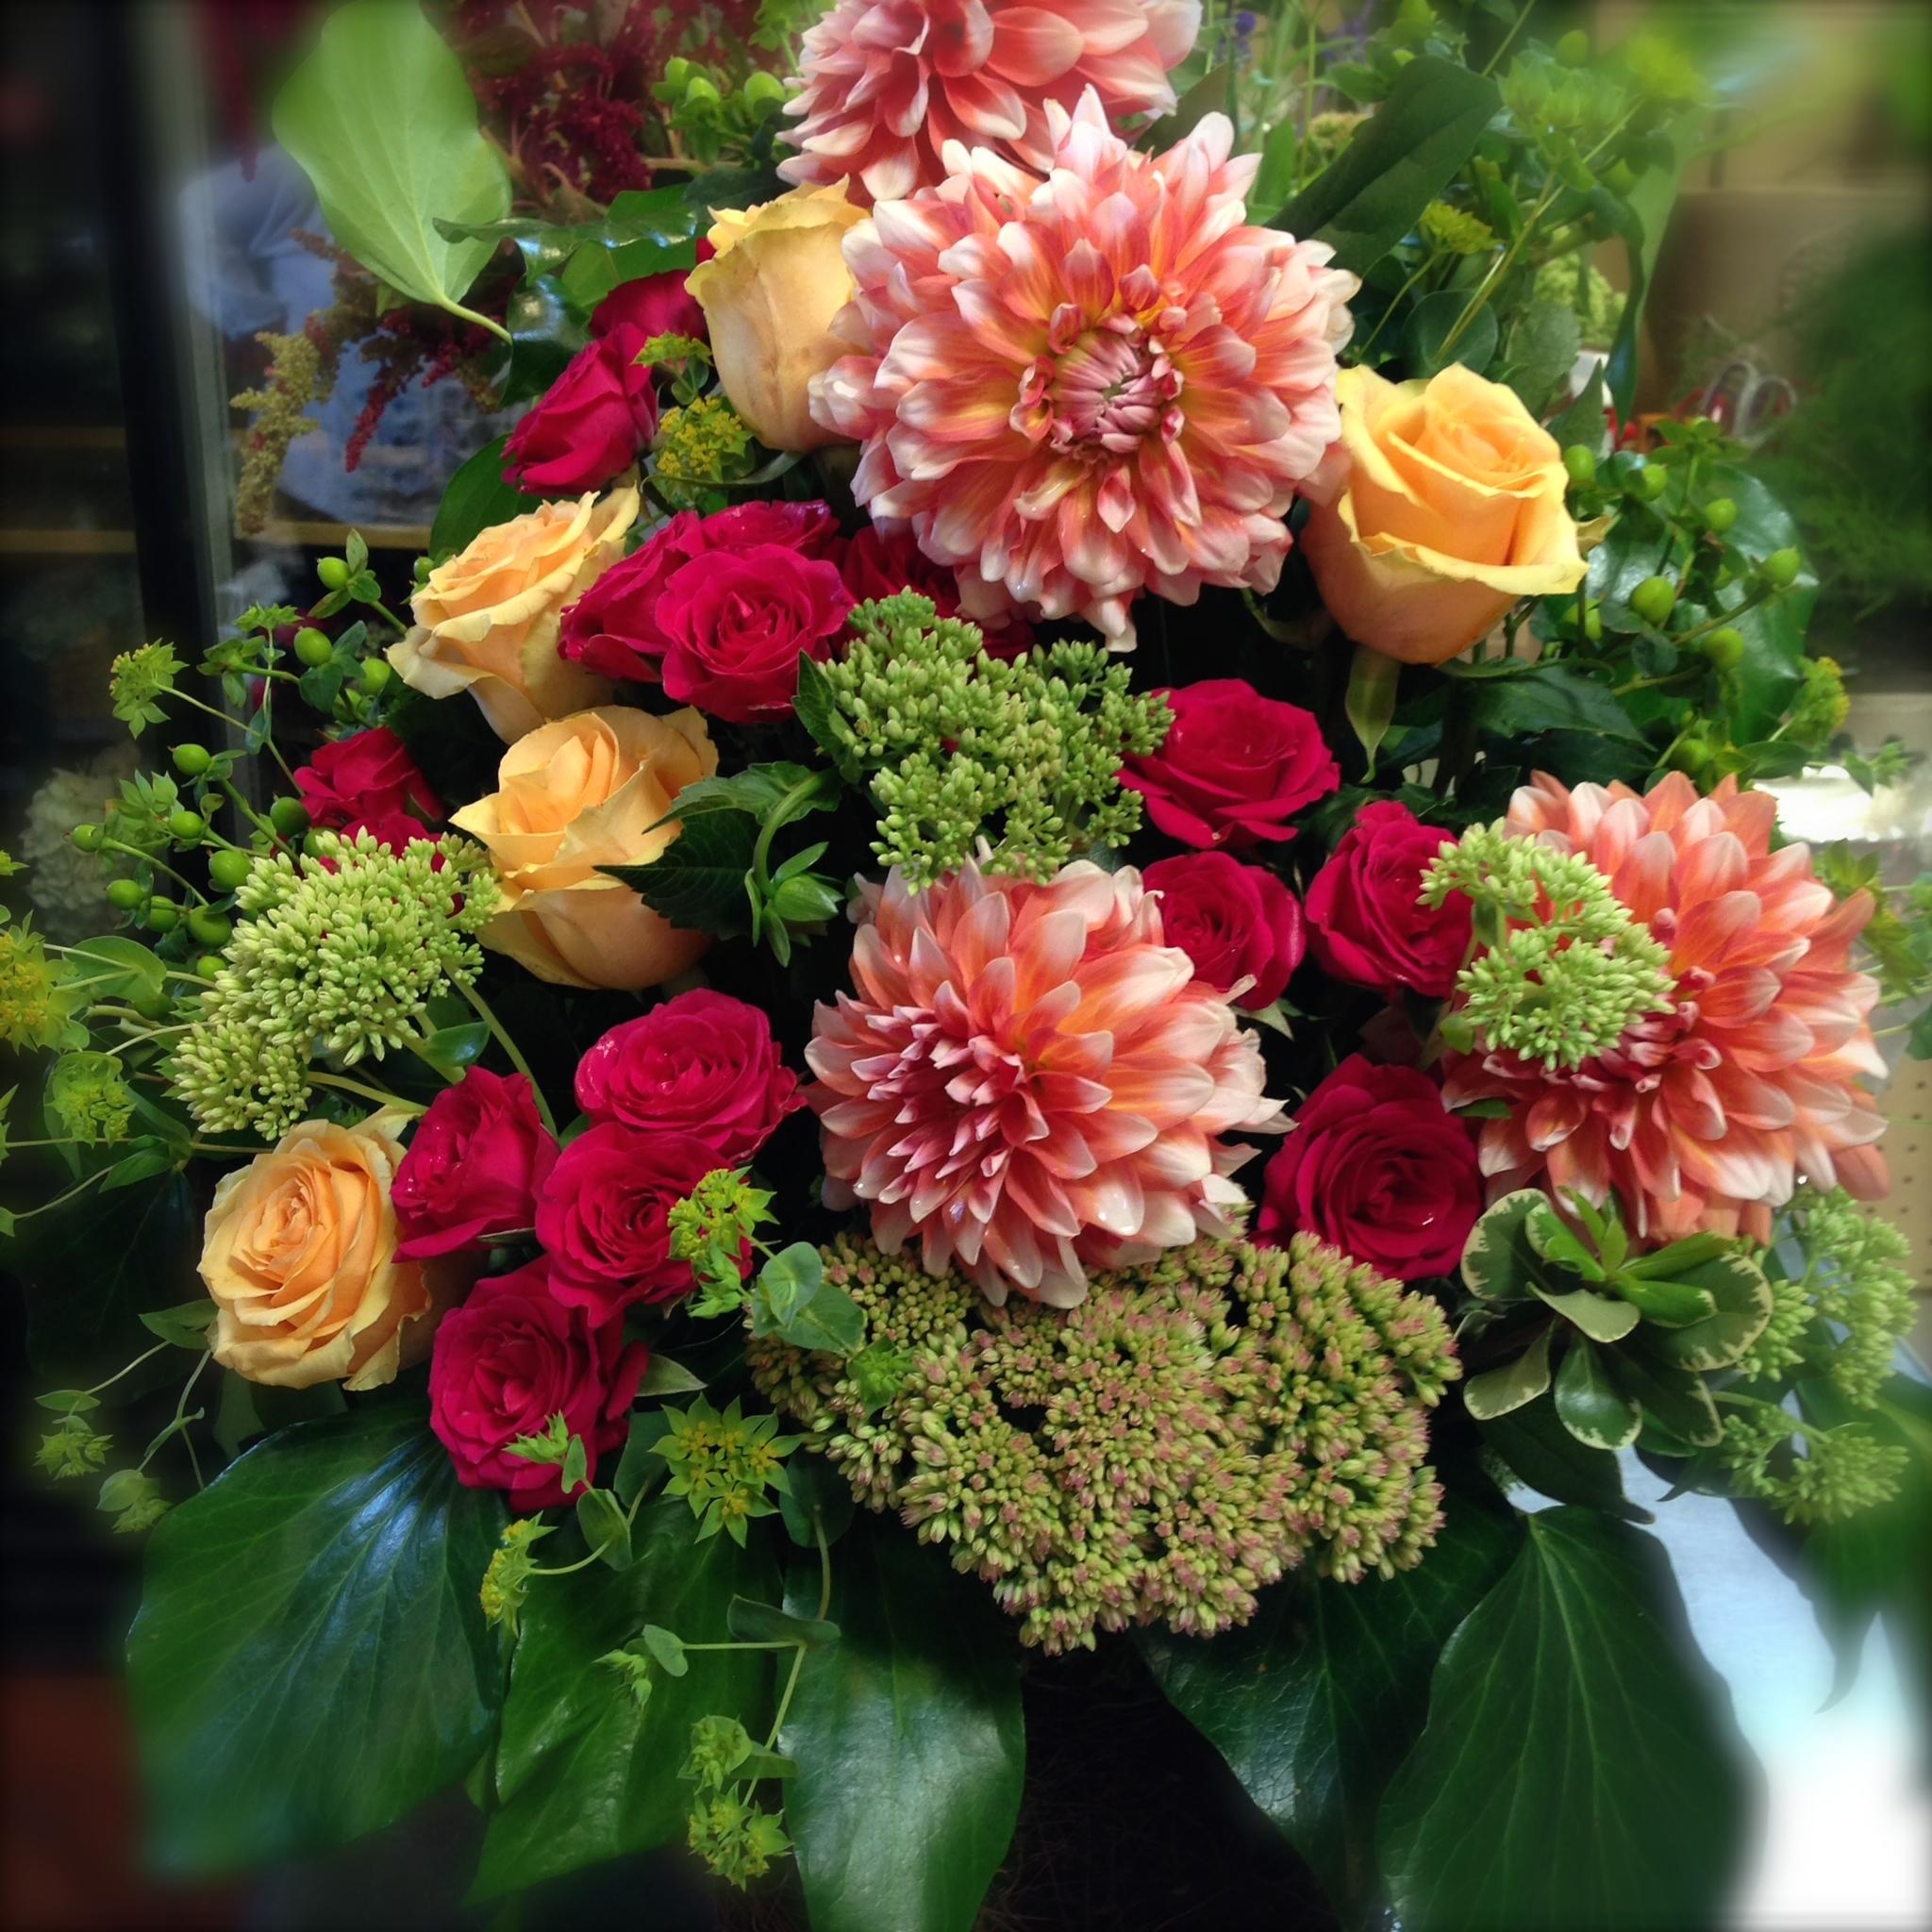 Rich Summer Dahlias, Roses & Sedum